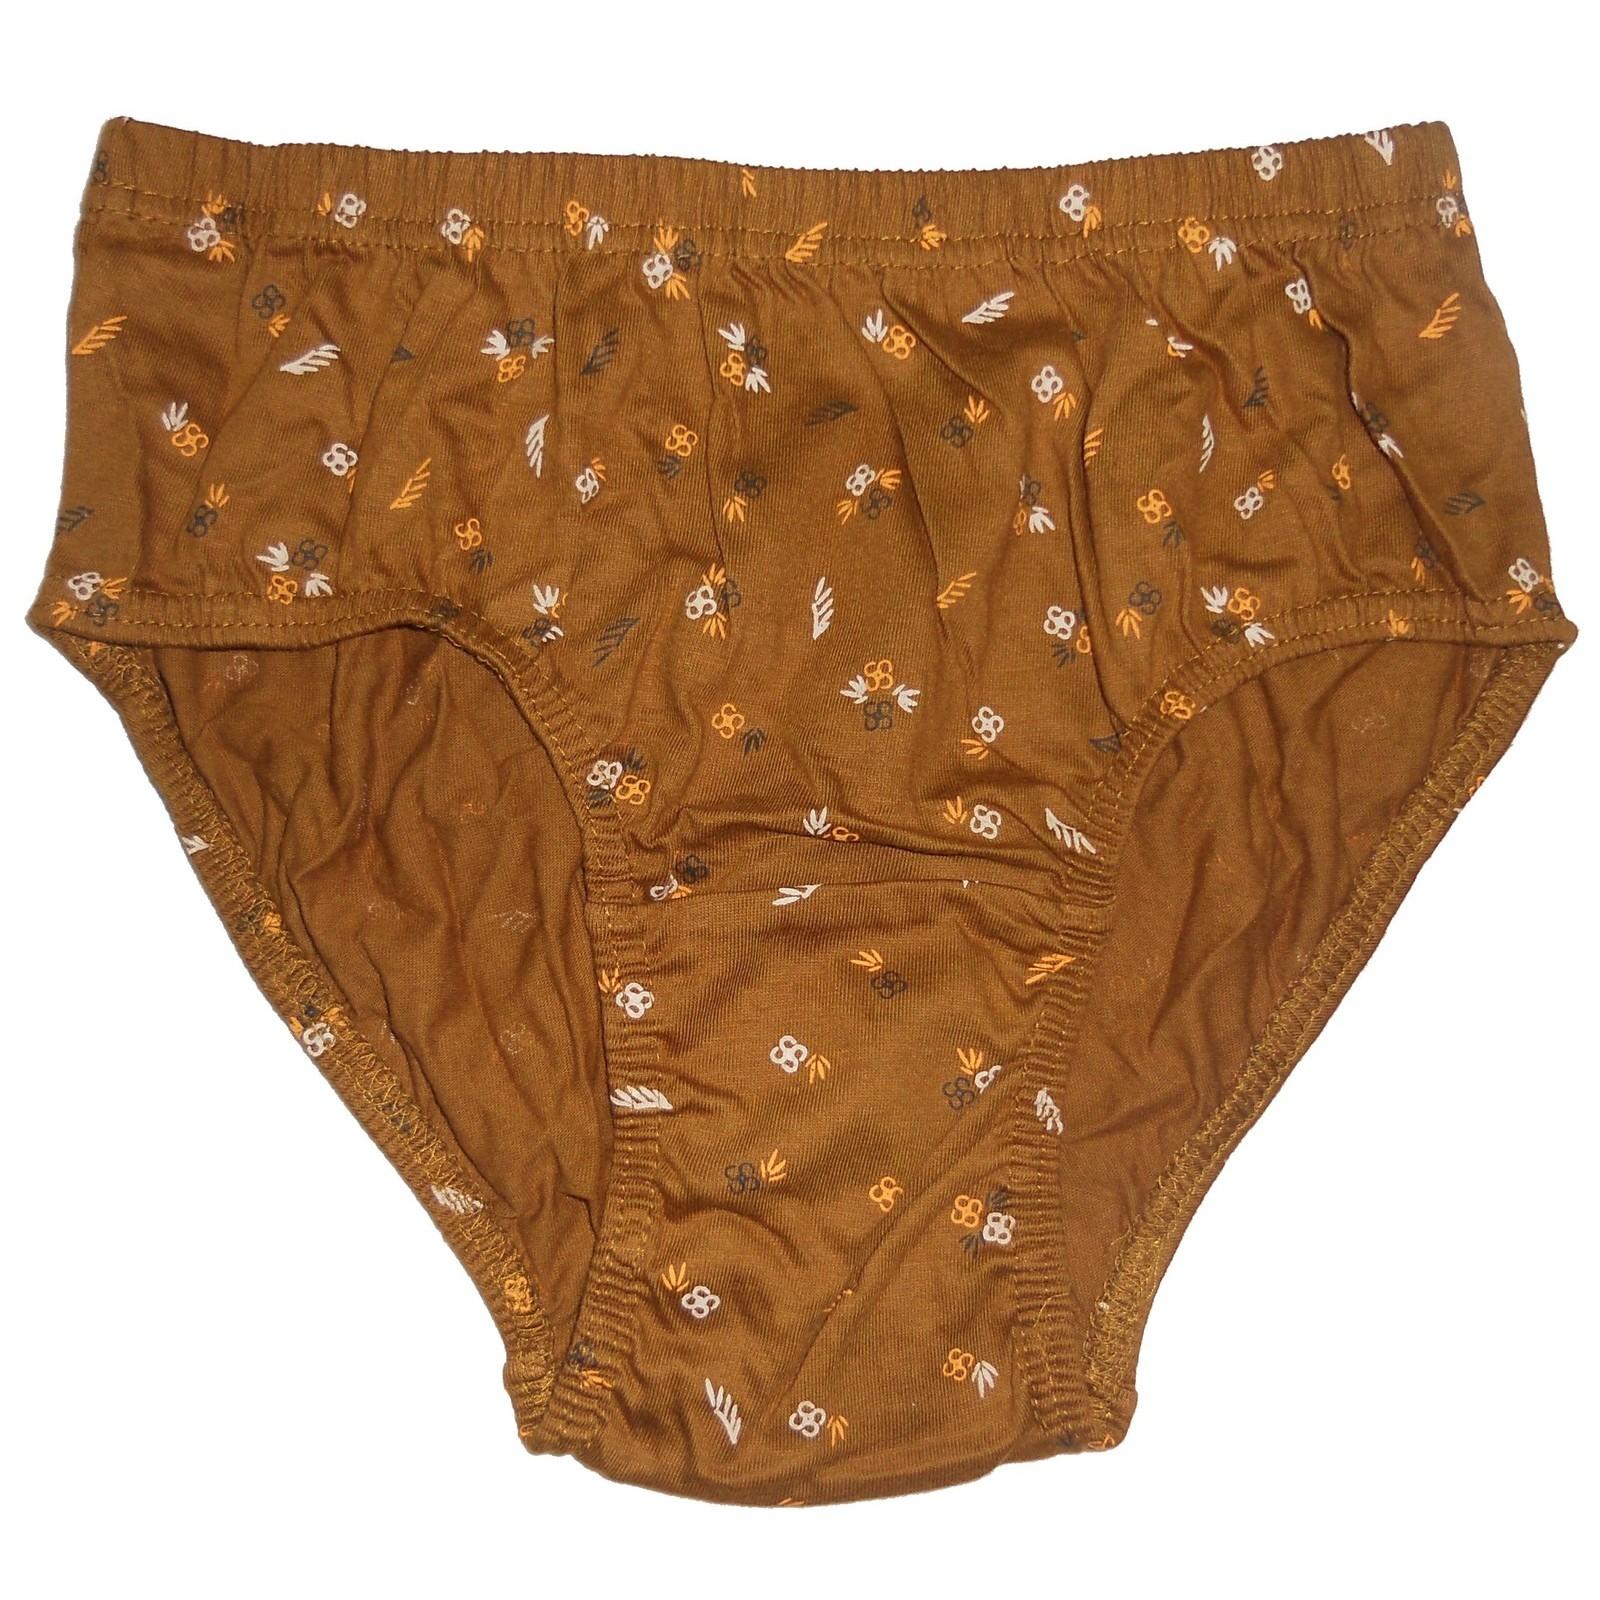 3123ef0fba49 Plus Size Panties   HerRoom.com